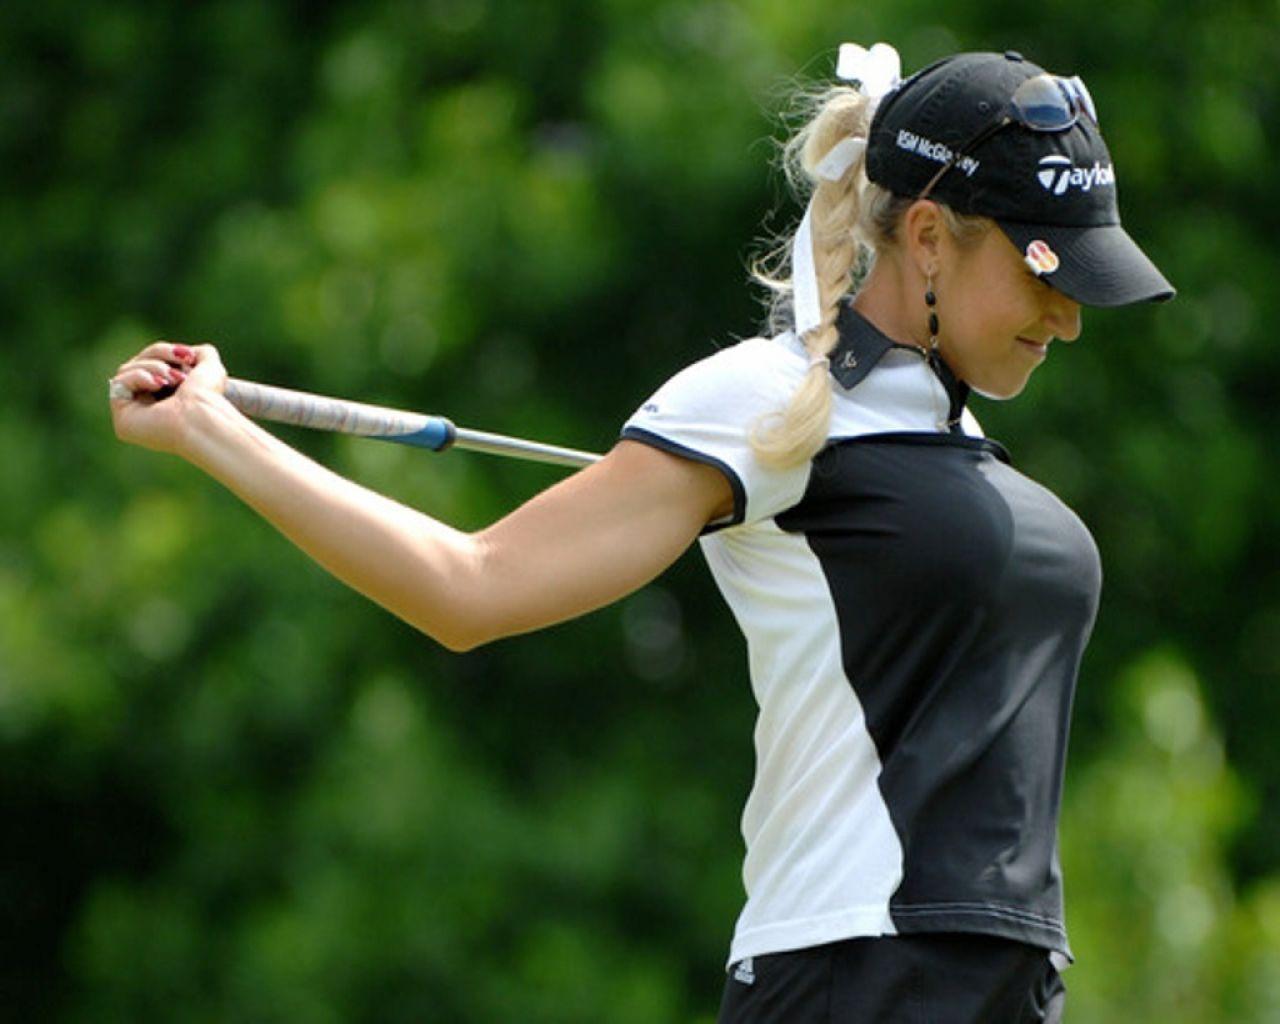 titties Female Golfers, Female Athletes, Women Athletes, Natalie Gulbis,  Funny Golf,